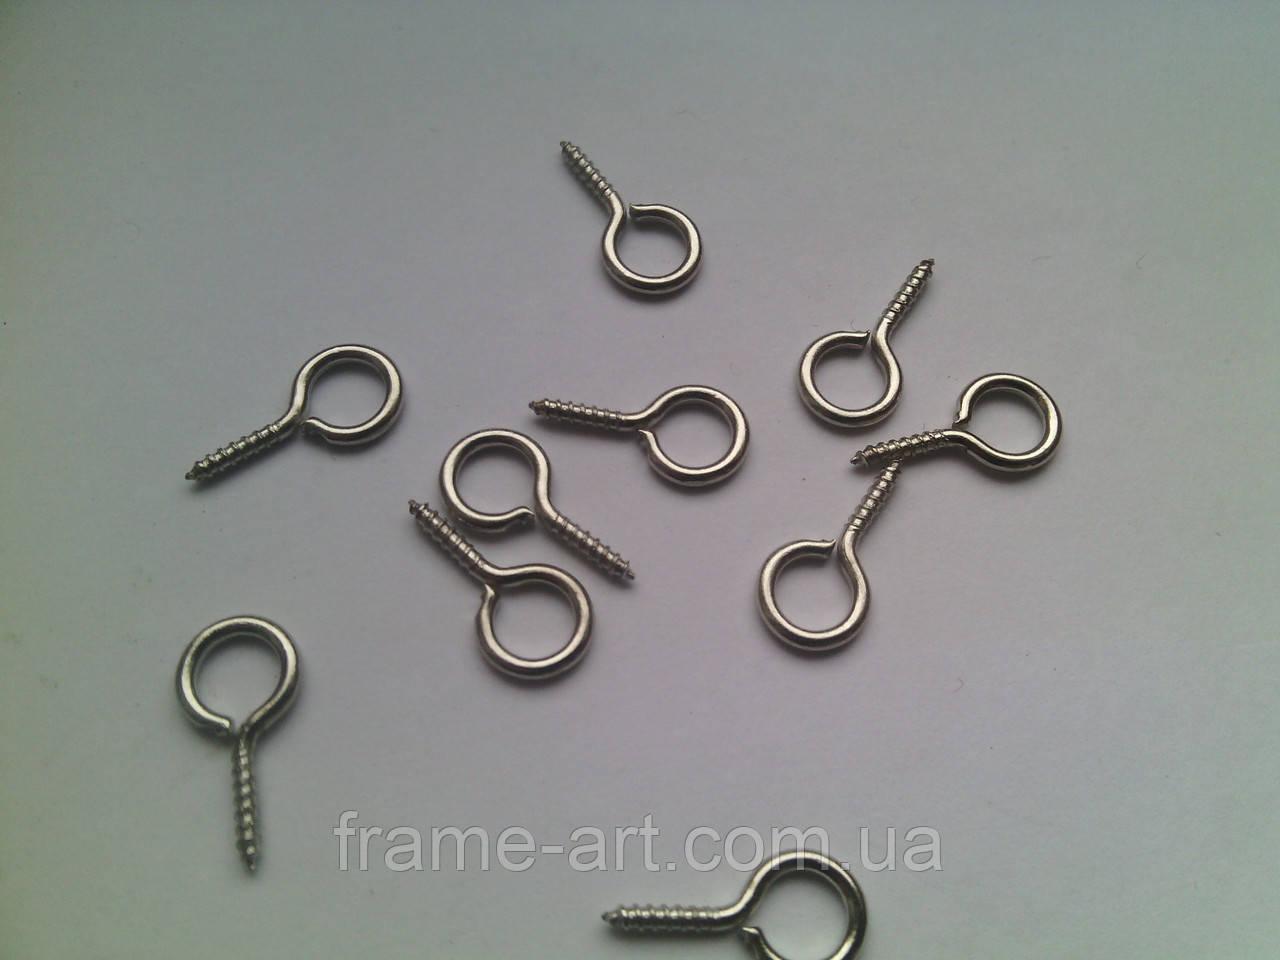 Крючок винт металлический 16*9мм серебро В-243-2